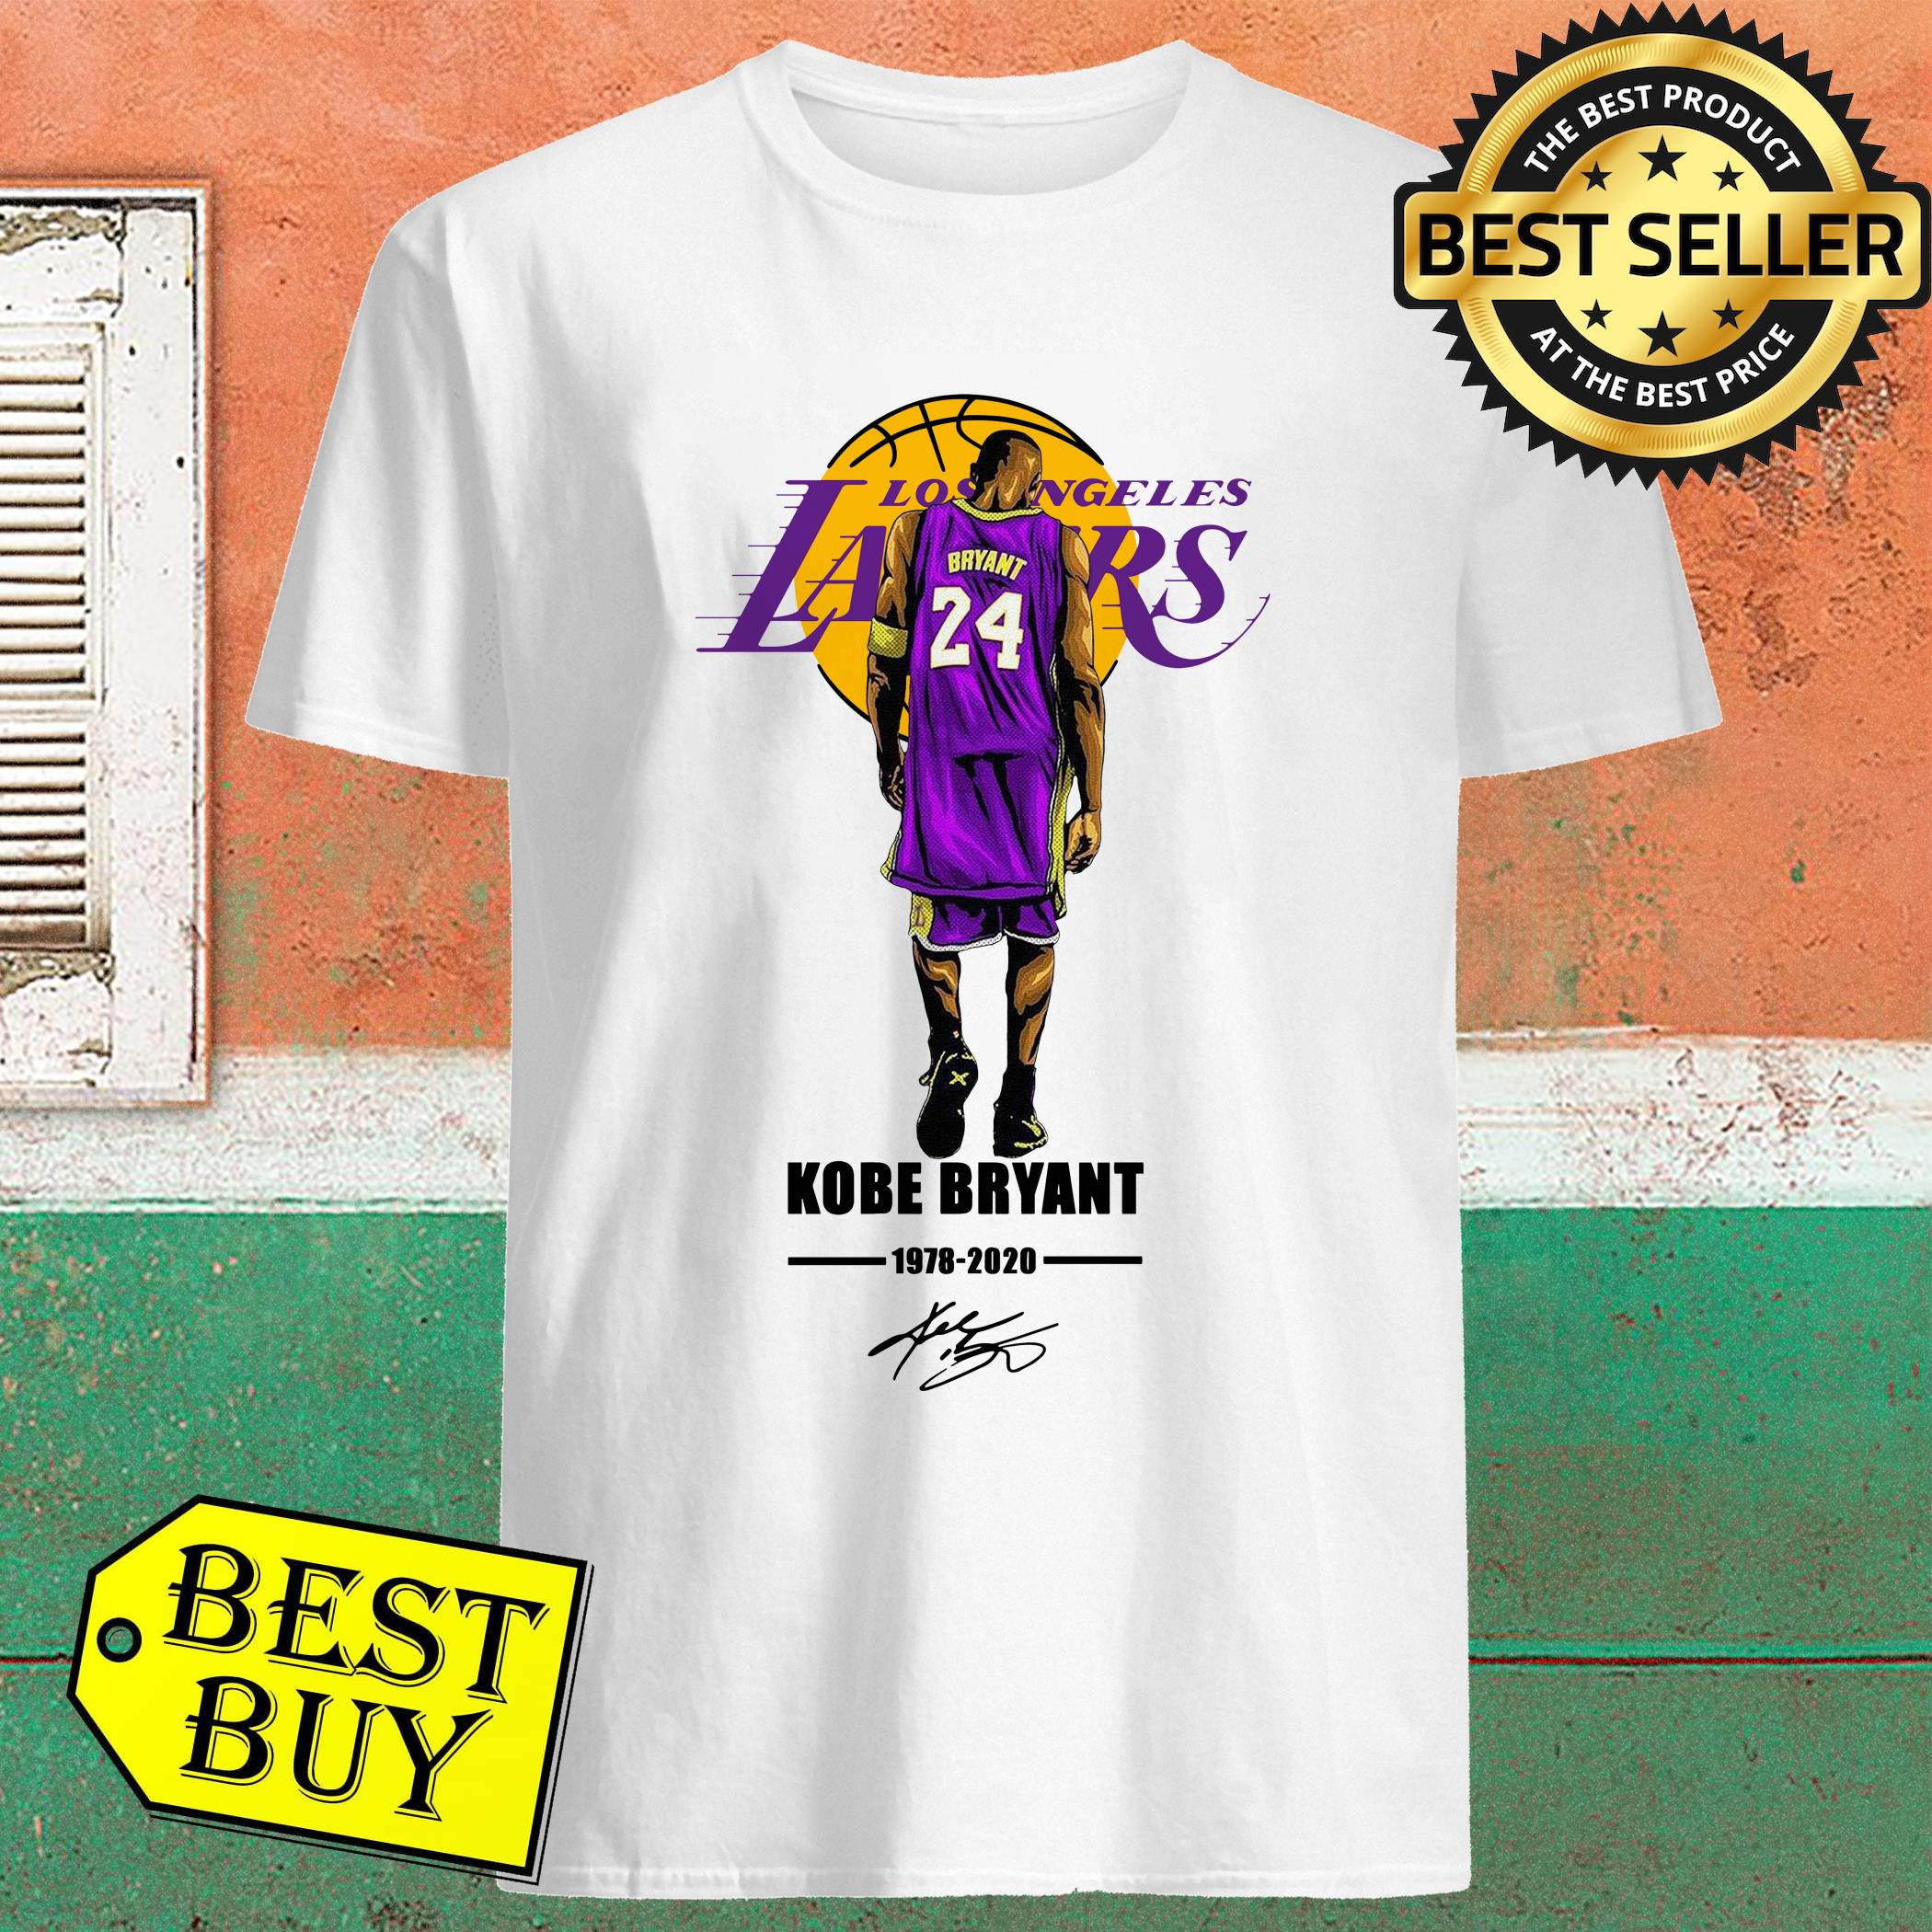 Los Angeles Lakers Rip Kobe Bryant 1978-2020 Signature Shirt